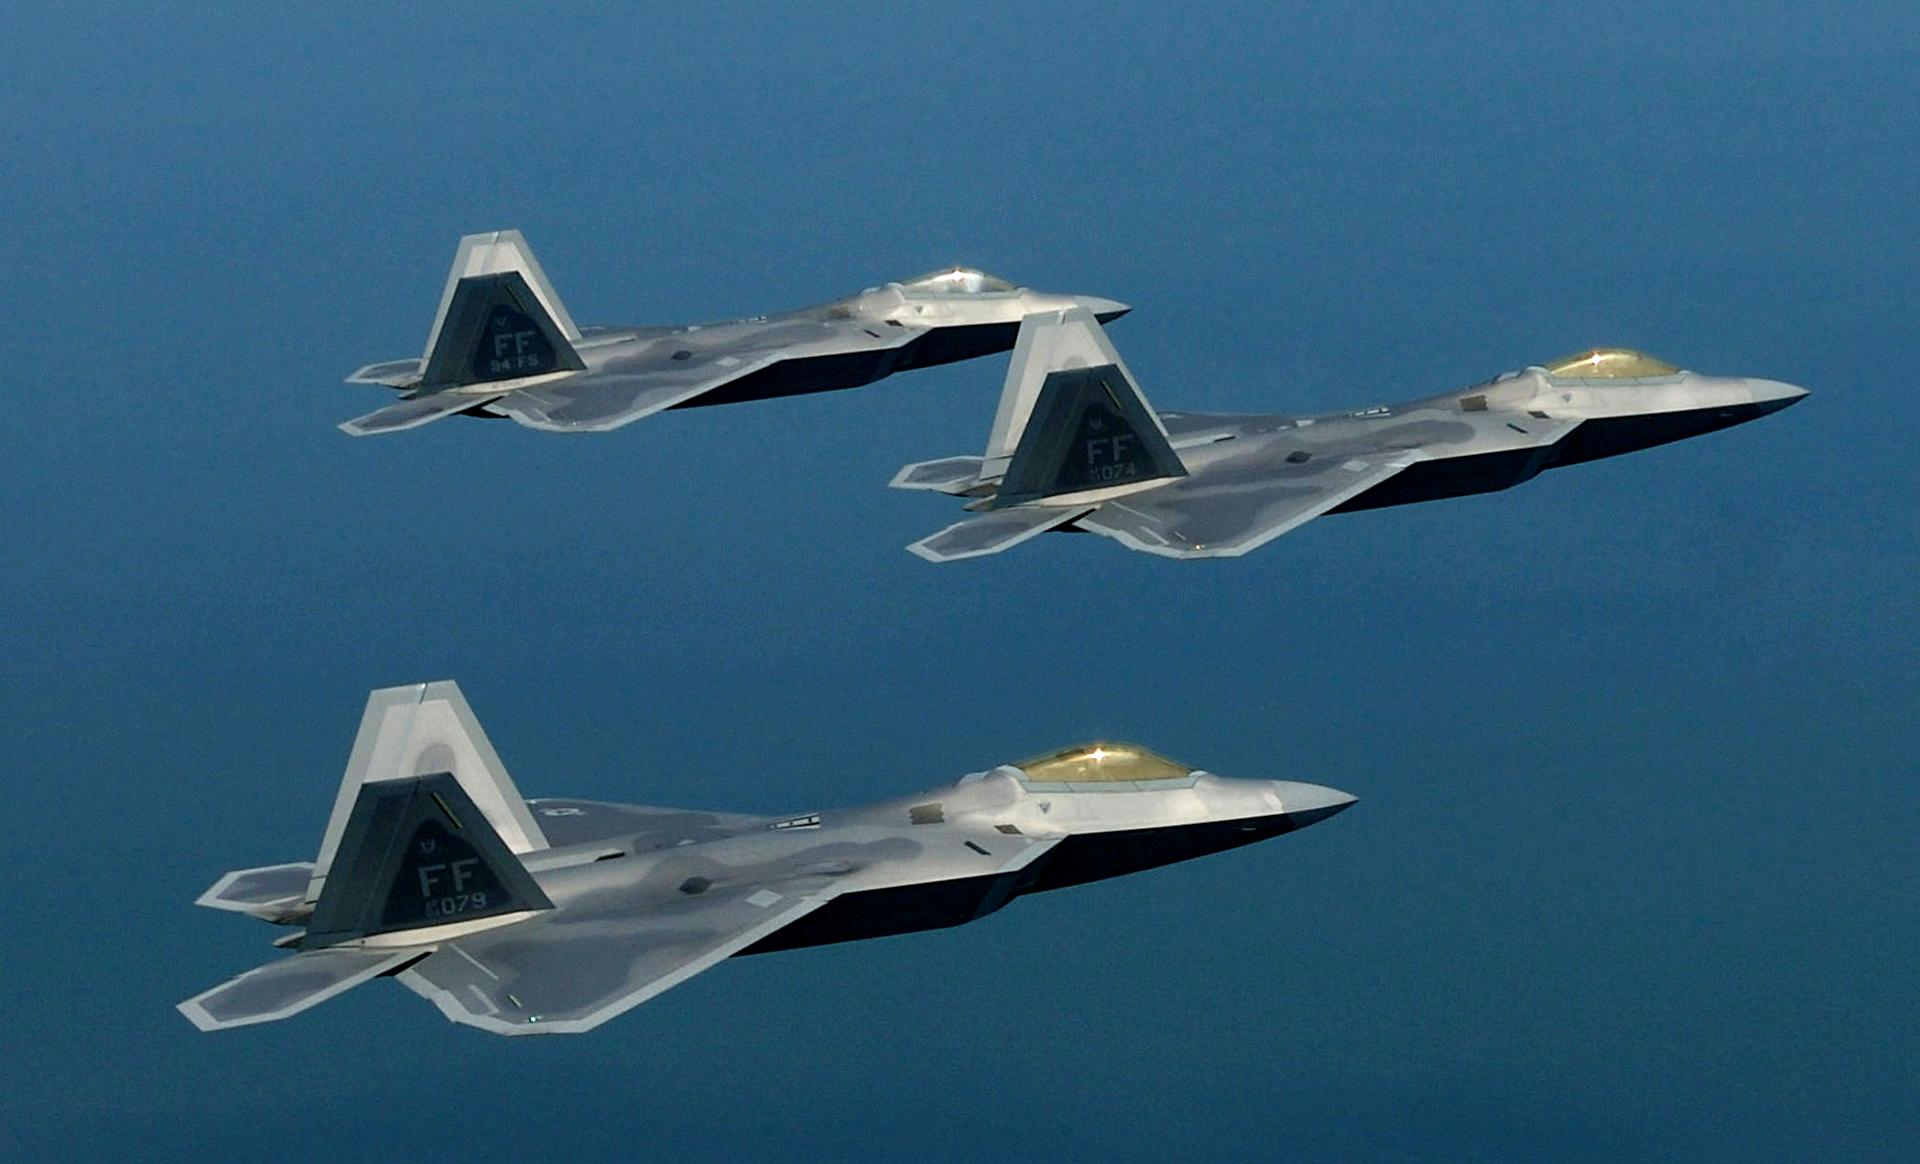 F-22 Raptor | Lockheed Martin